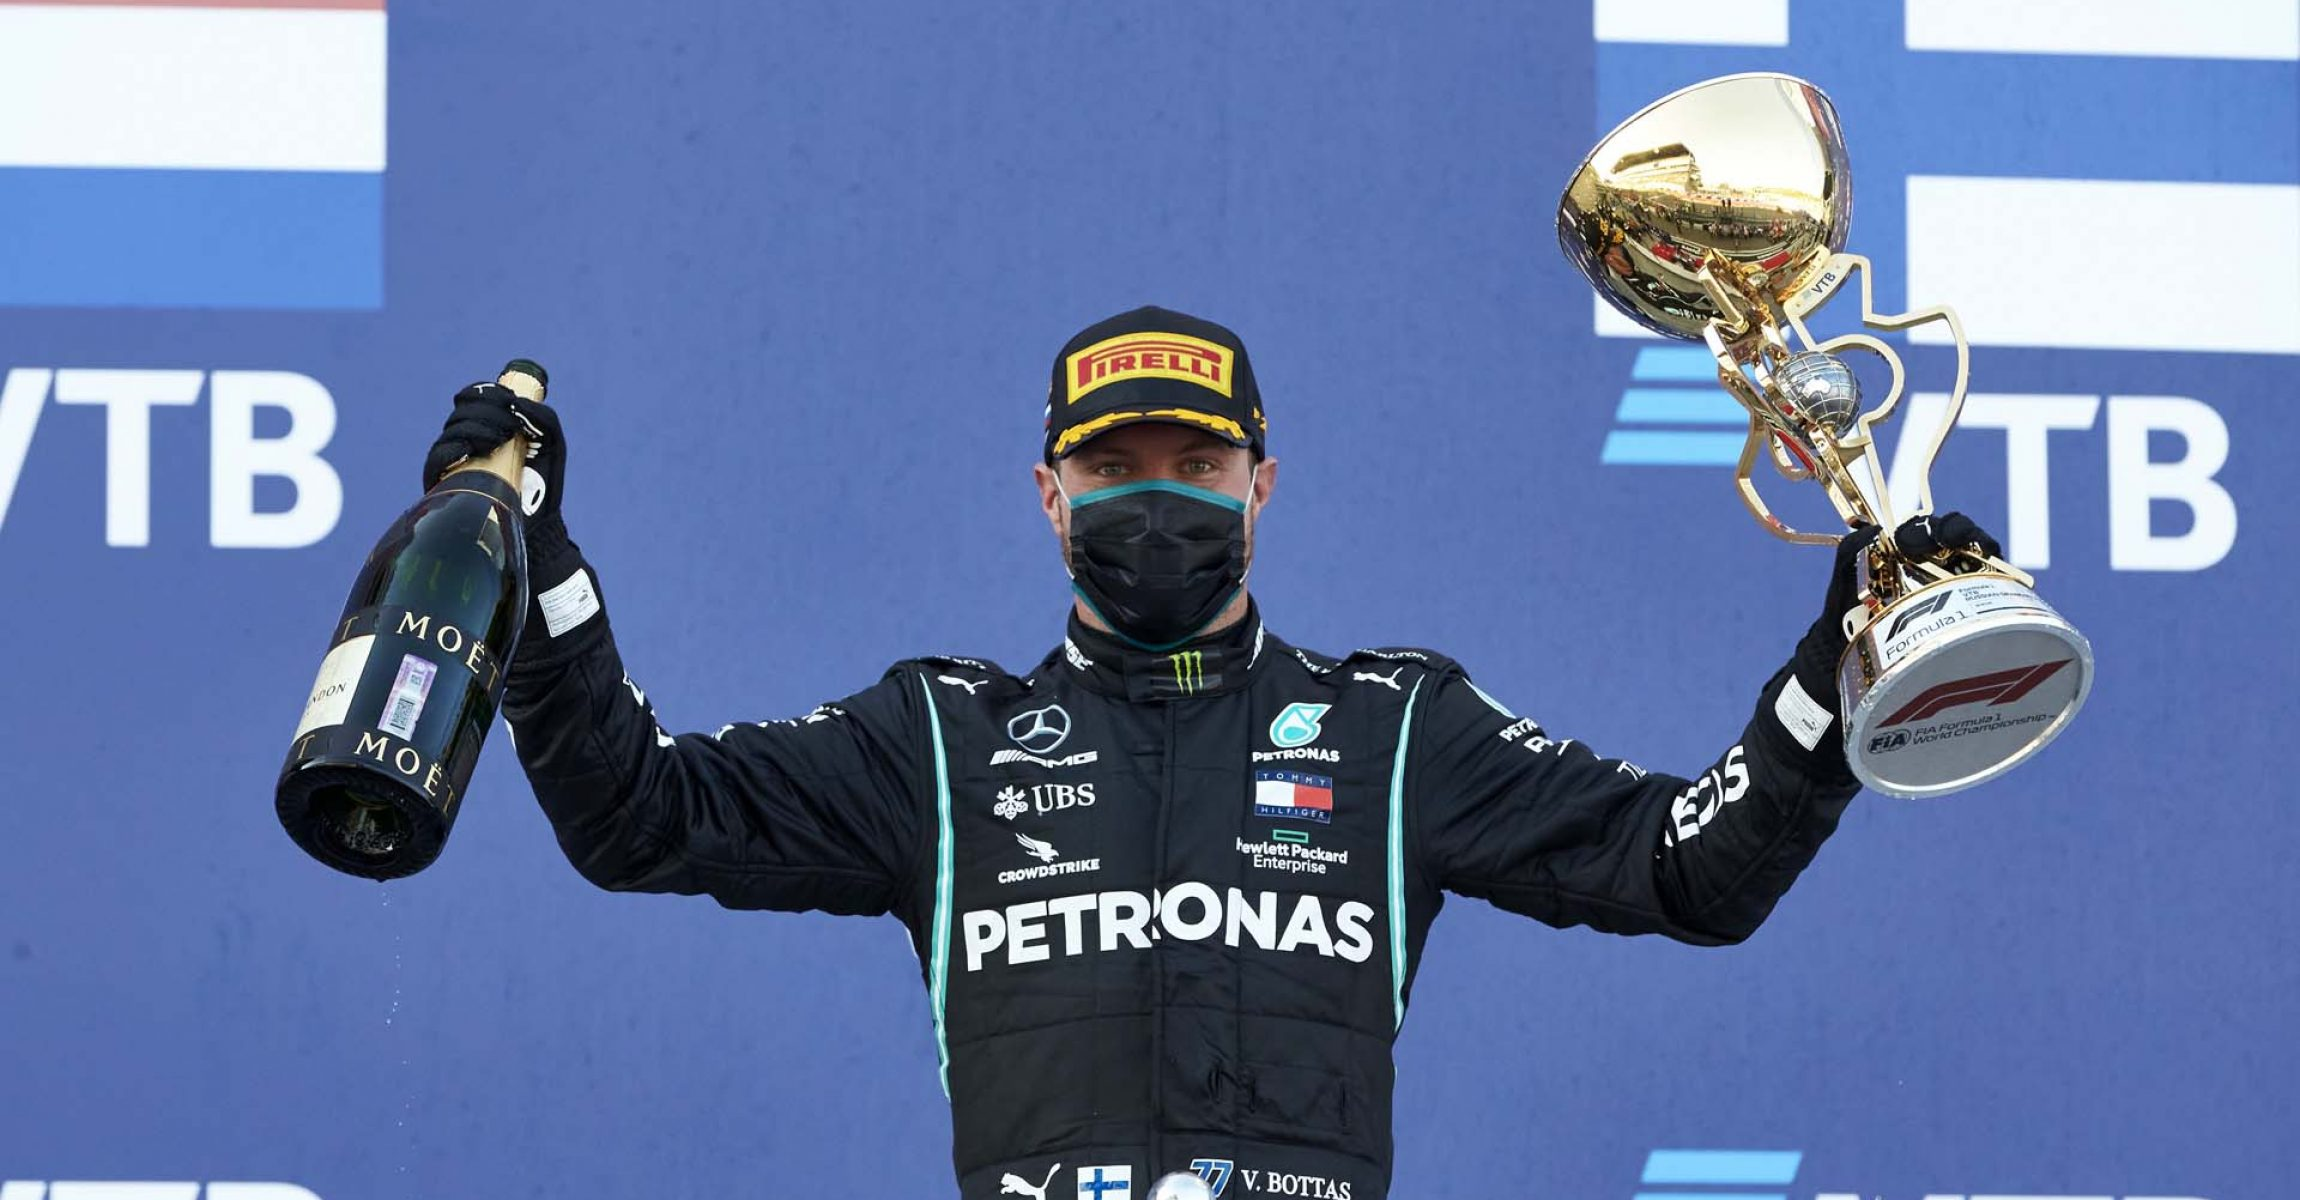 2020 Russian Grand Prix, Sunday - Steve Etherington Valtteri Bottas Mercedes